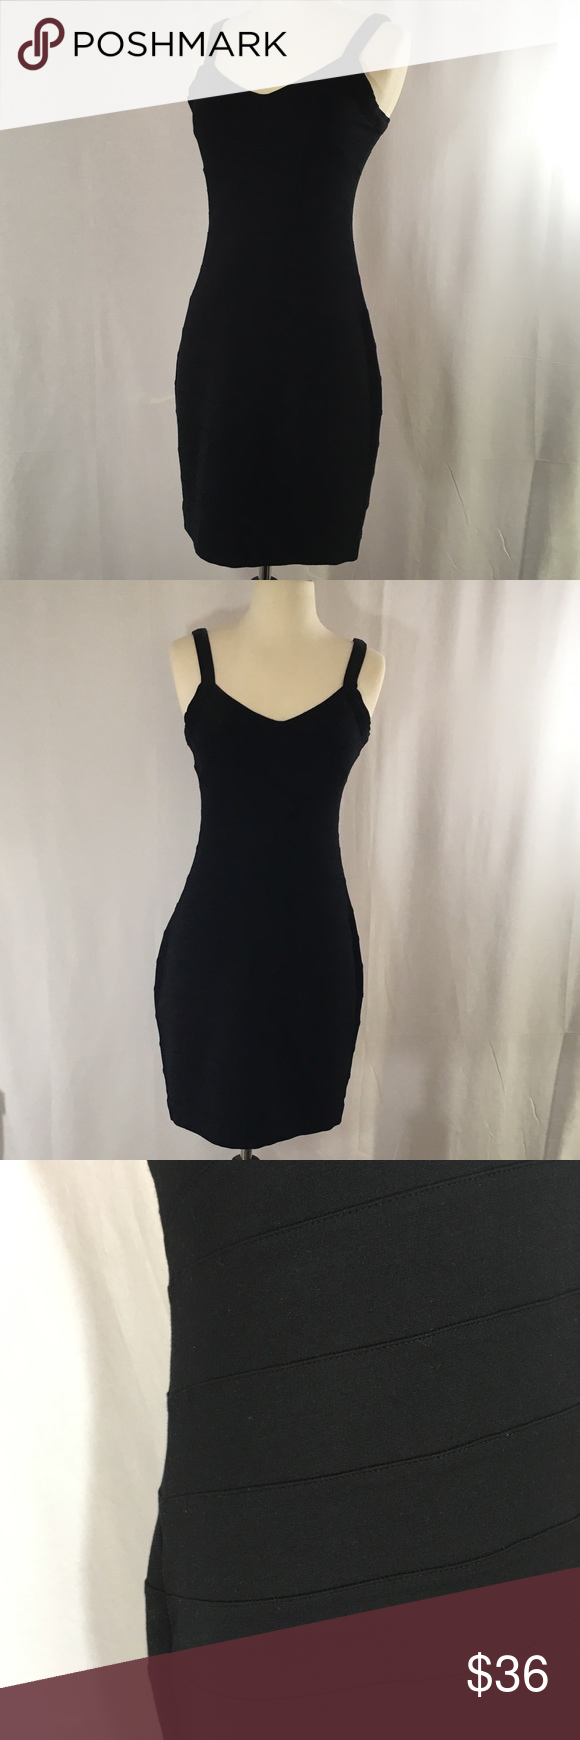 Express xs black dress bandage style of fabric